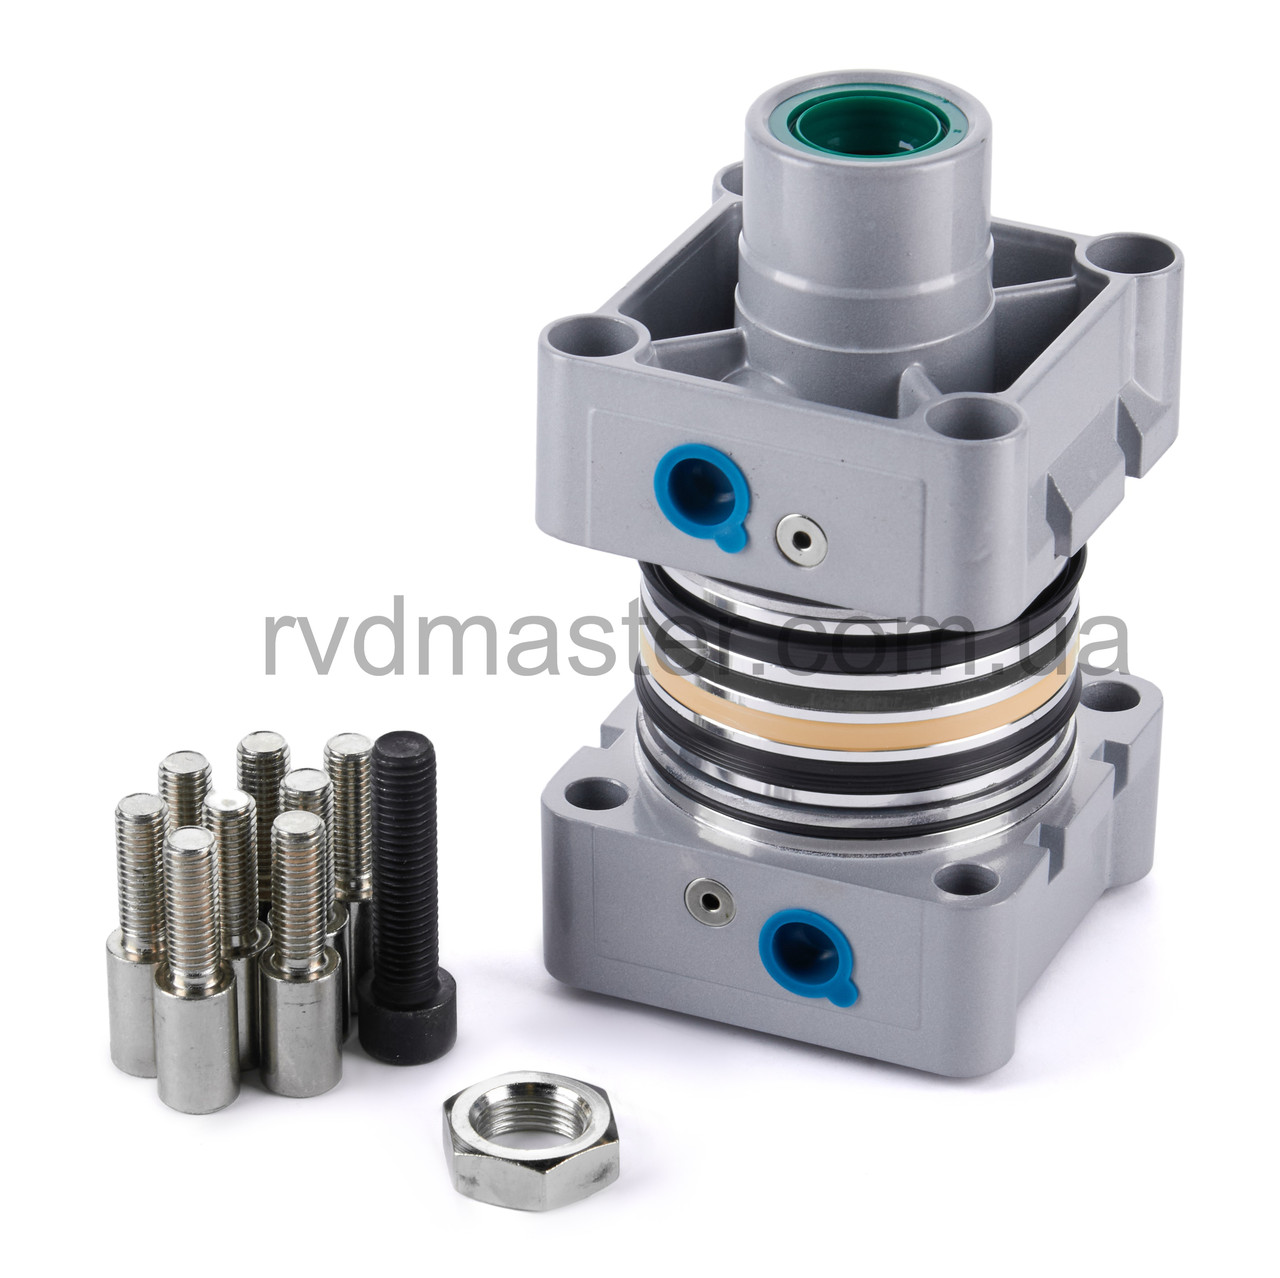 Комплект для сборки пневматического цилиндра, диаметром поршня 32mm